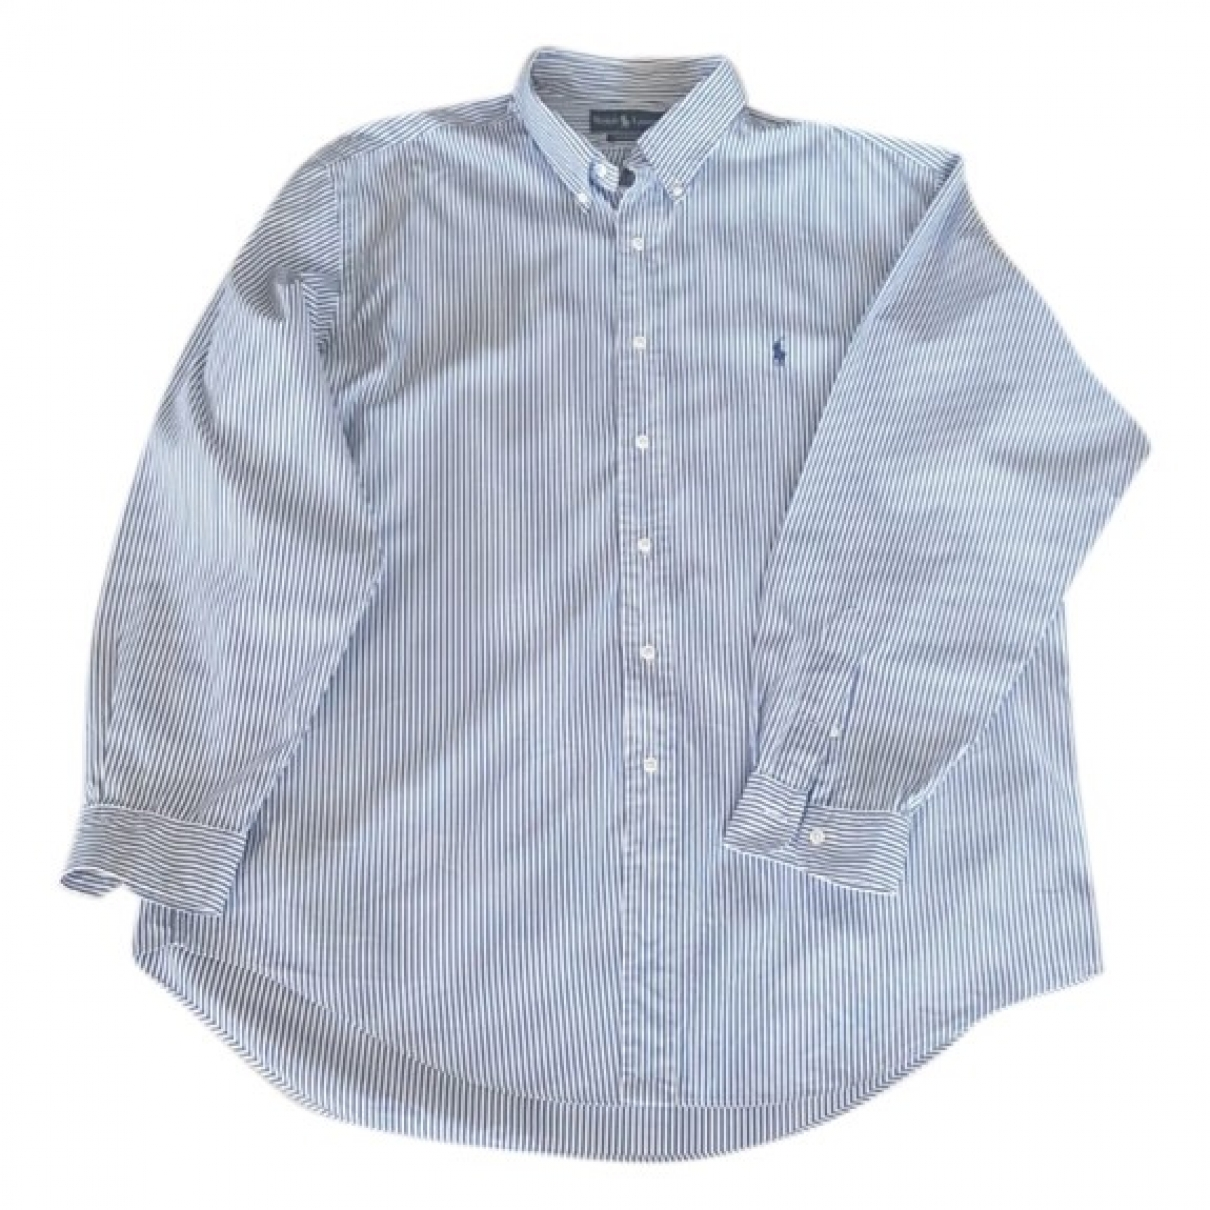 Polo Ralph Lauren \N Navy Cotton Shirts for Men 17.5 UK - US (tour de cou / collar)